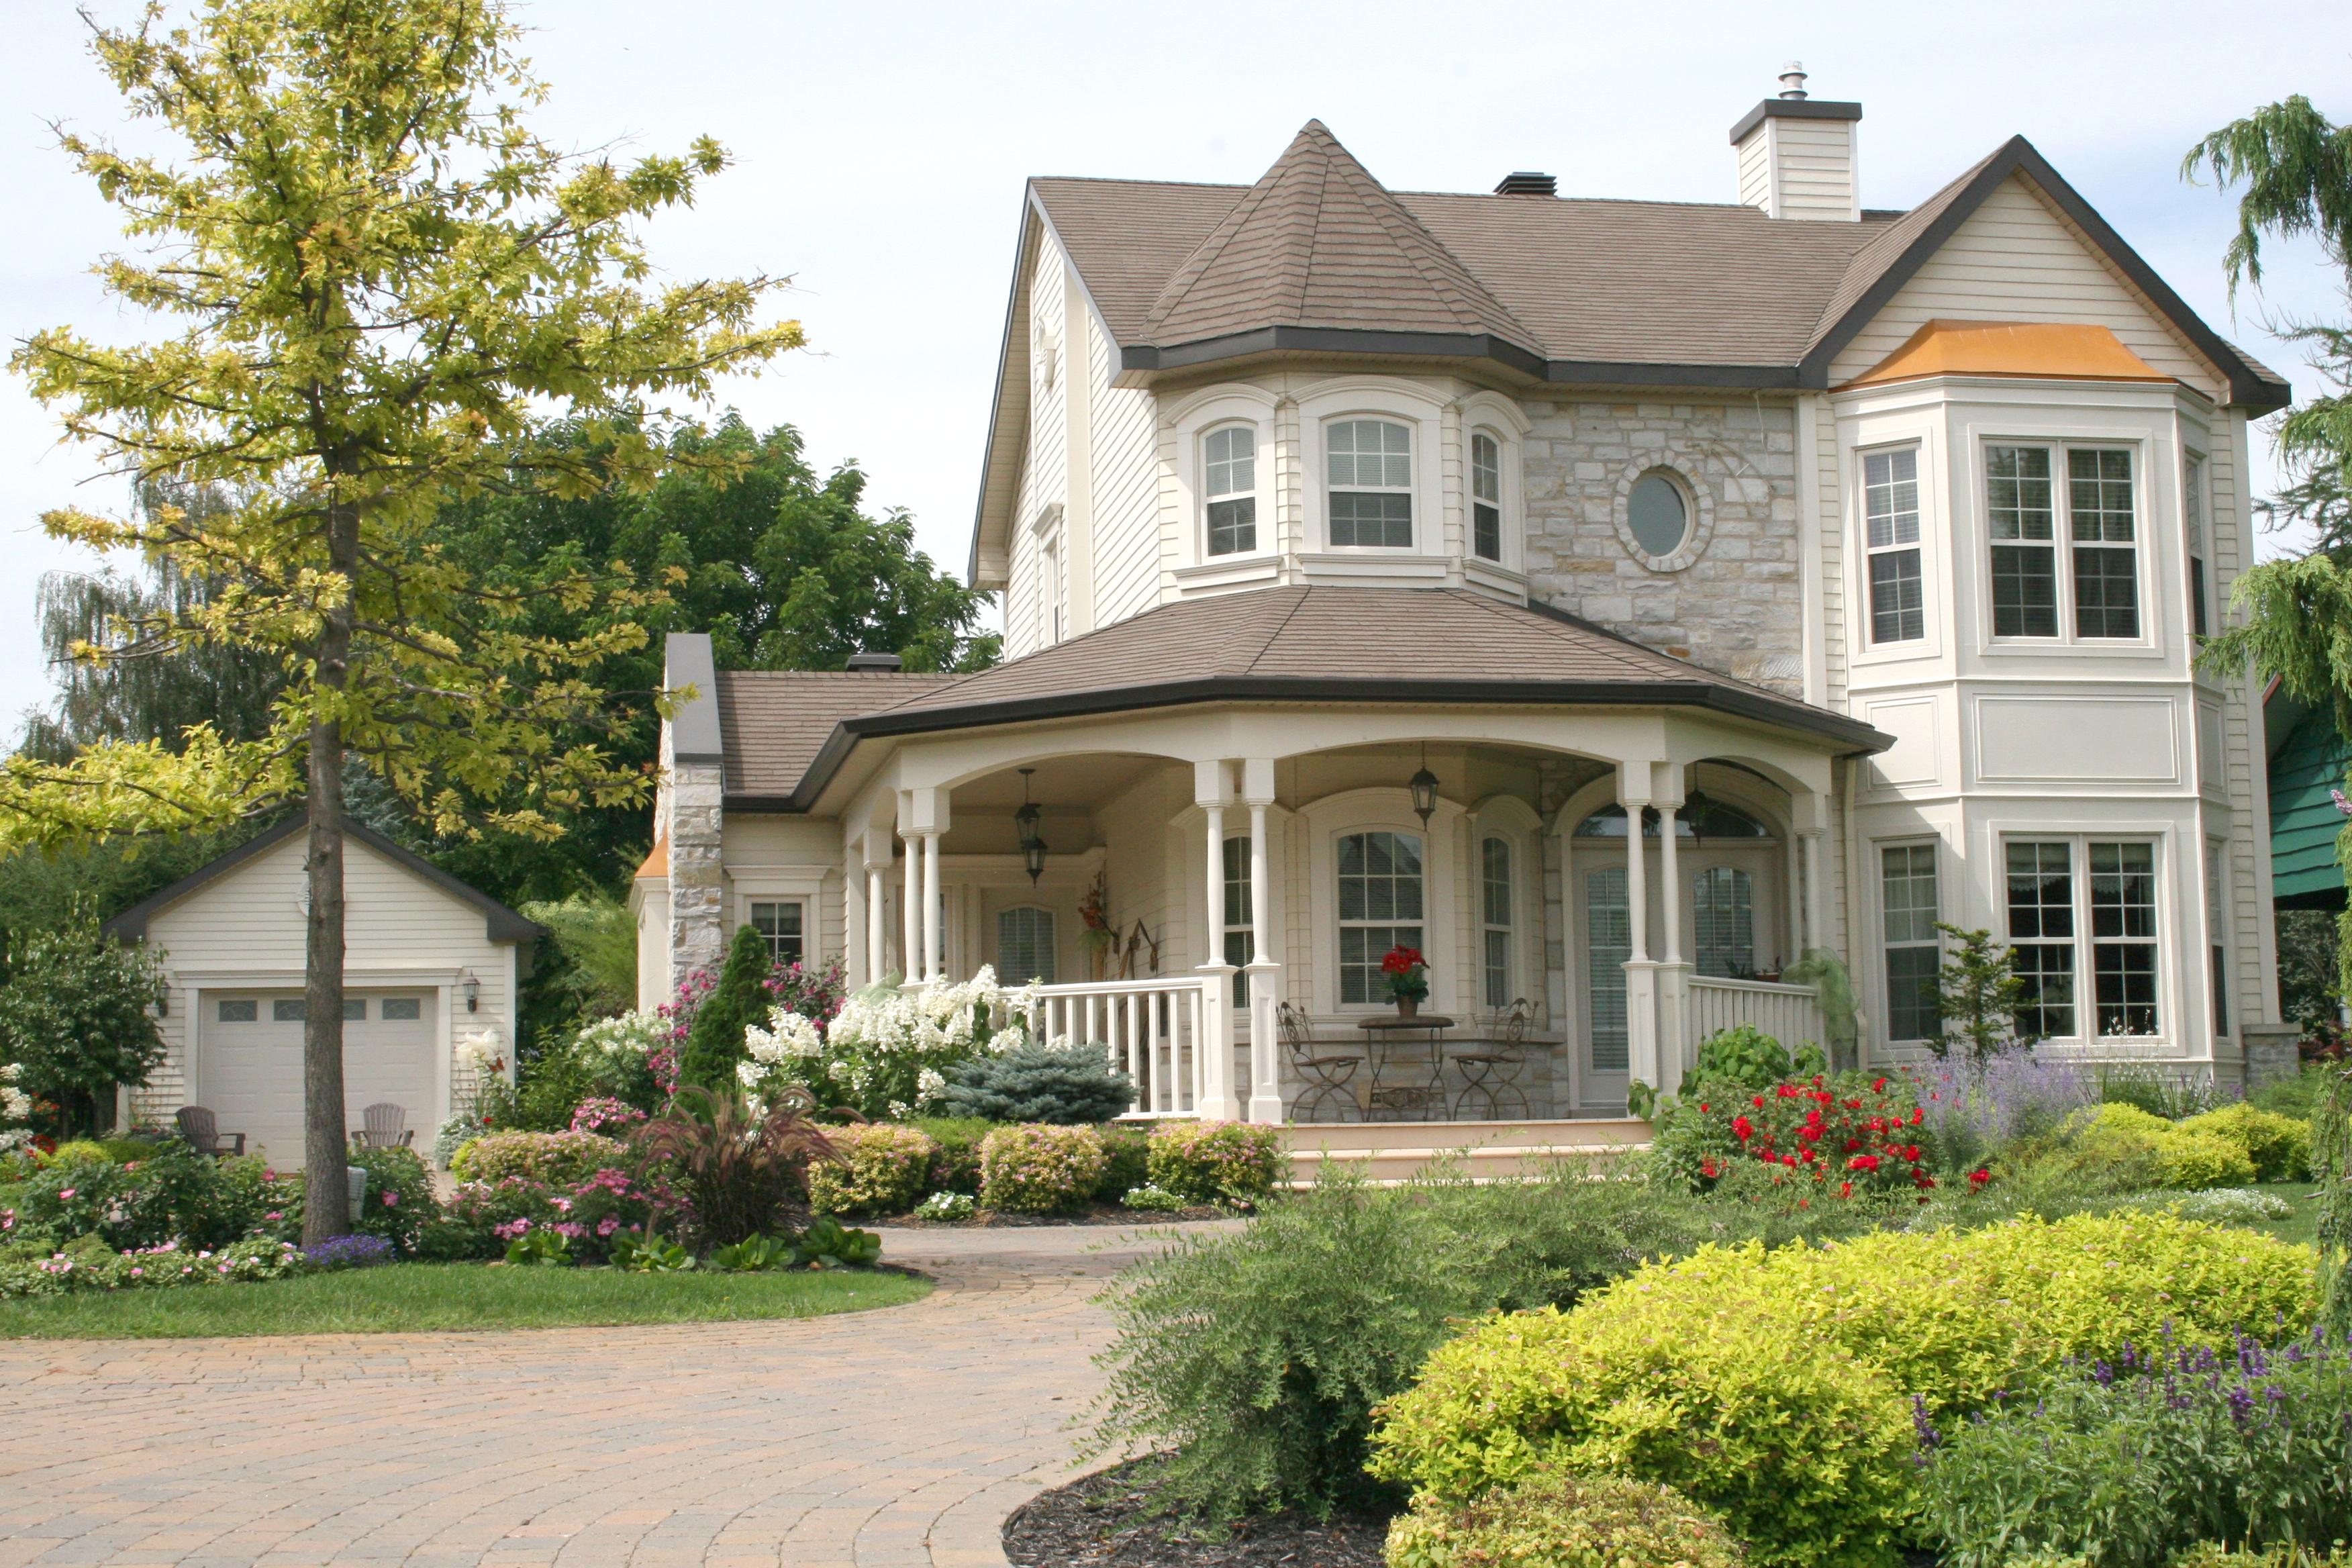 HOUSE-EXTERIOR-PHOTO